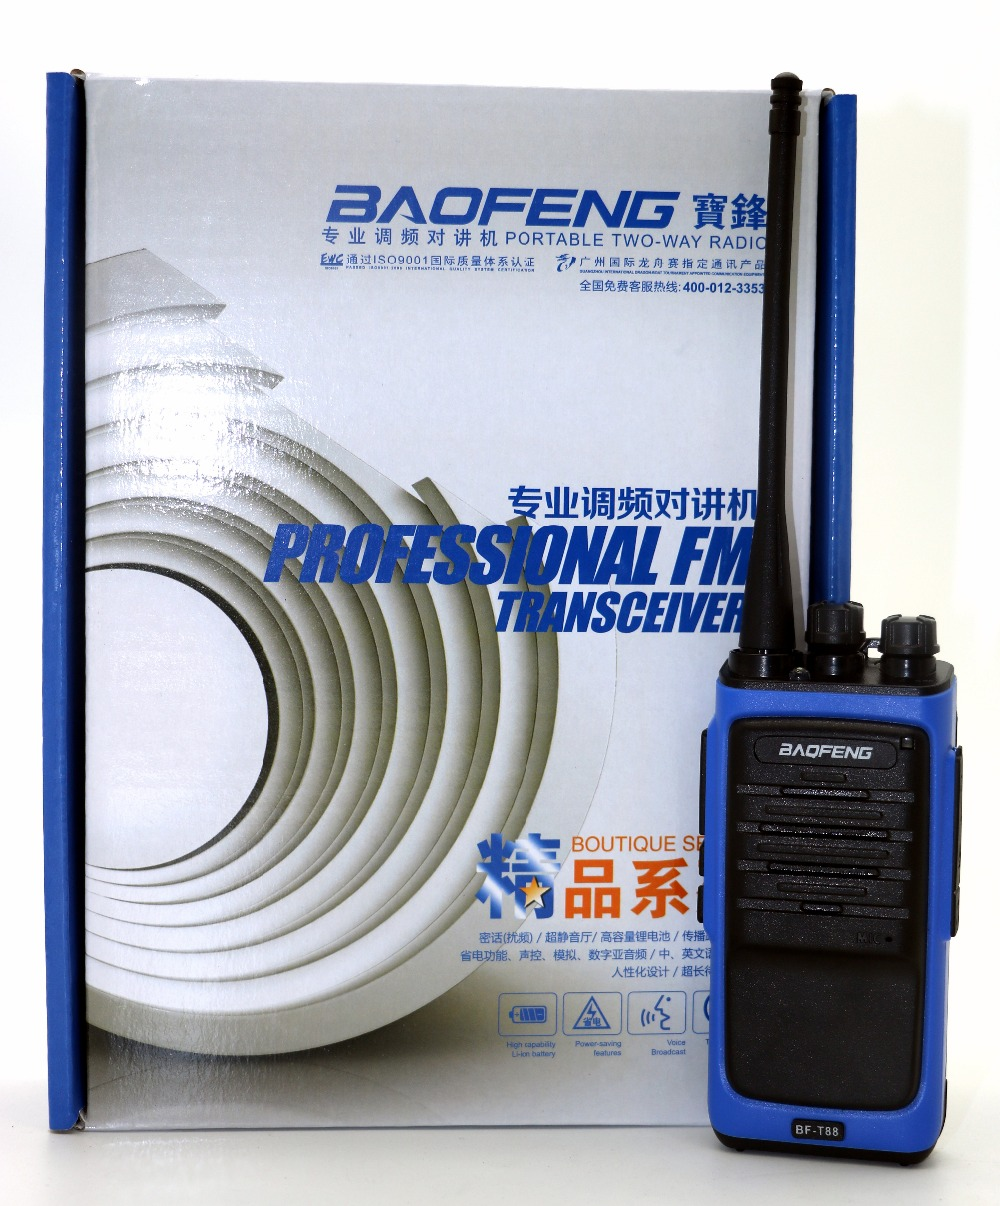 Baofeng BF-T88 מכשיר הקשר BFT88 16CH 5W UHF 400-480MHz Cb - ווקי טוקי